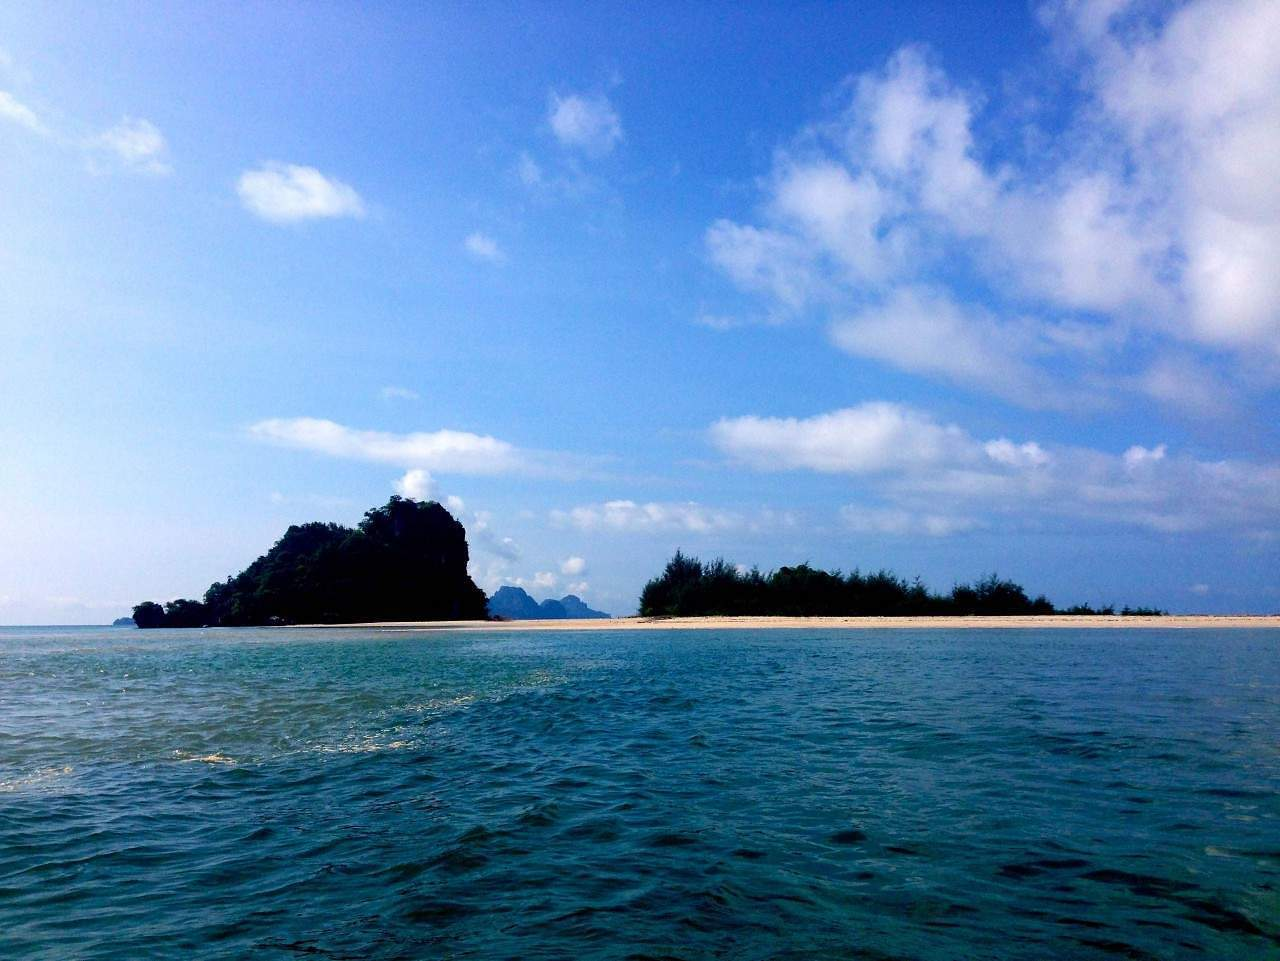 Thailand - Insel bei Phuket